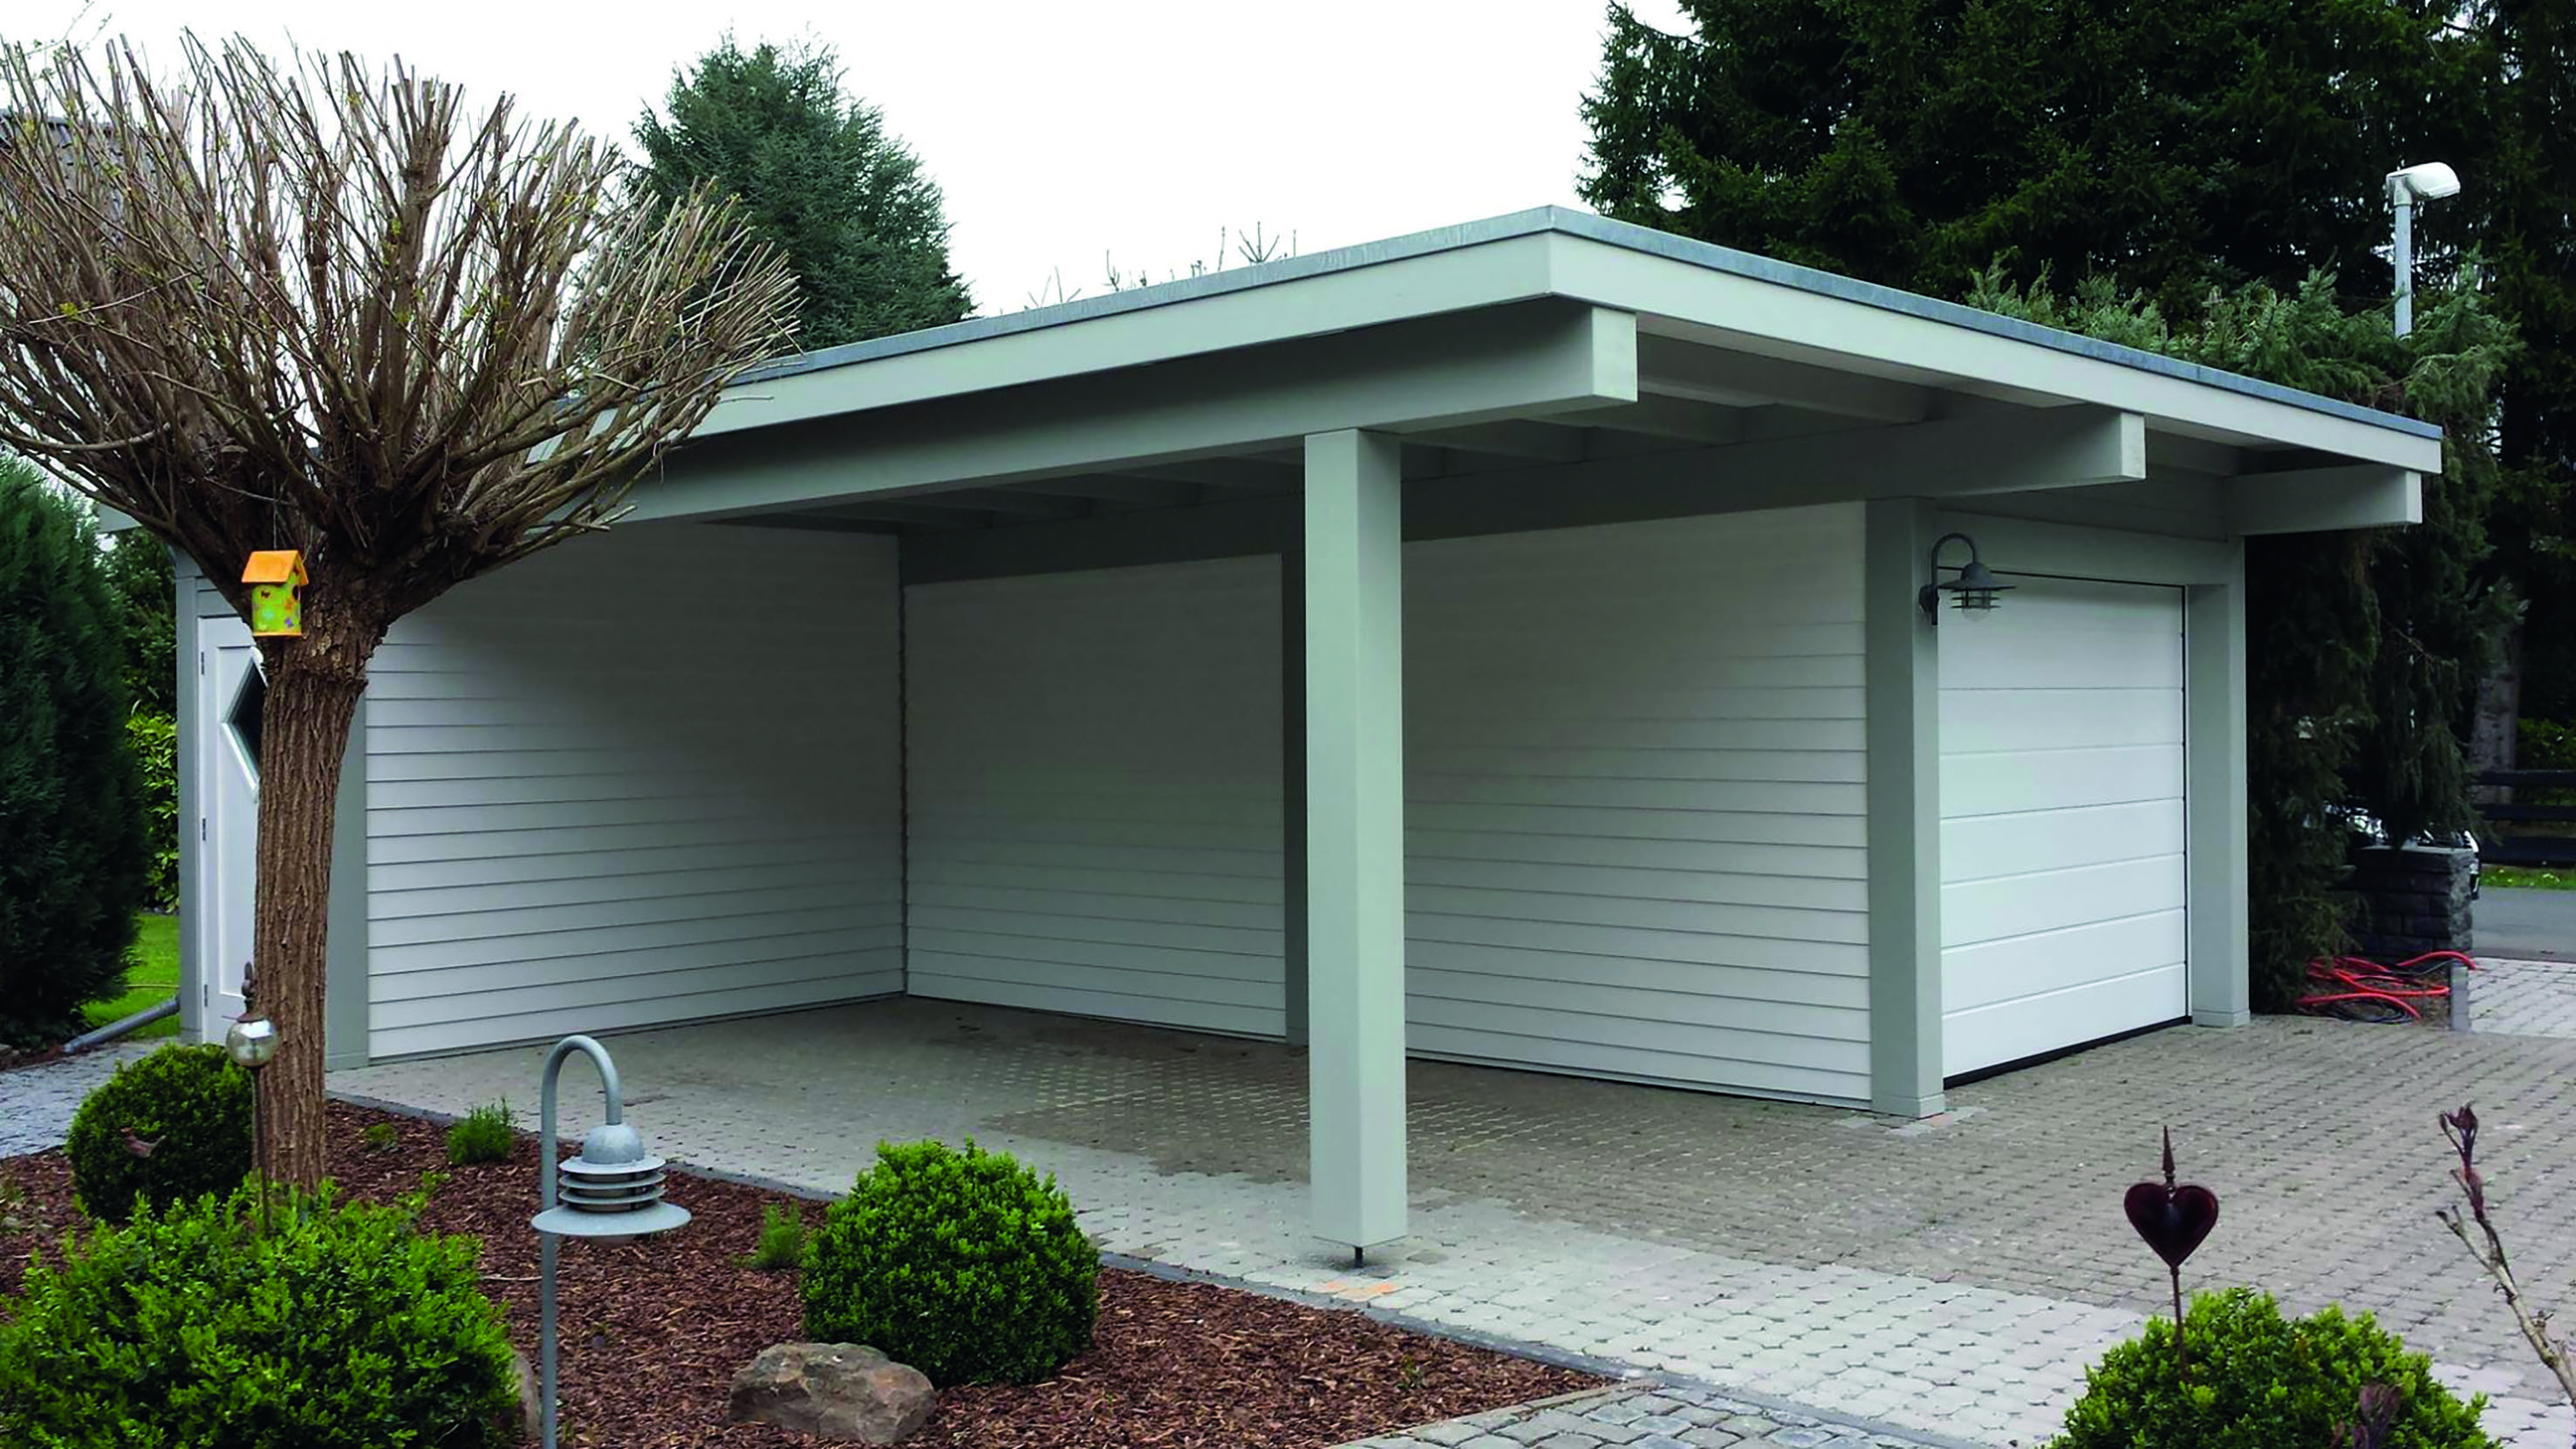 Carport, Garage, Stülpschalung